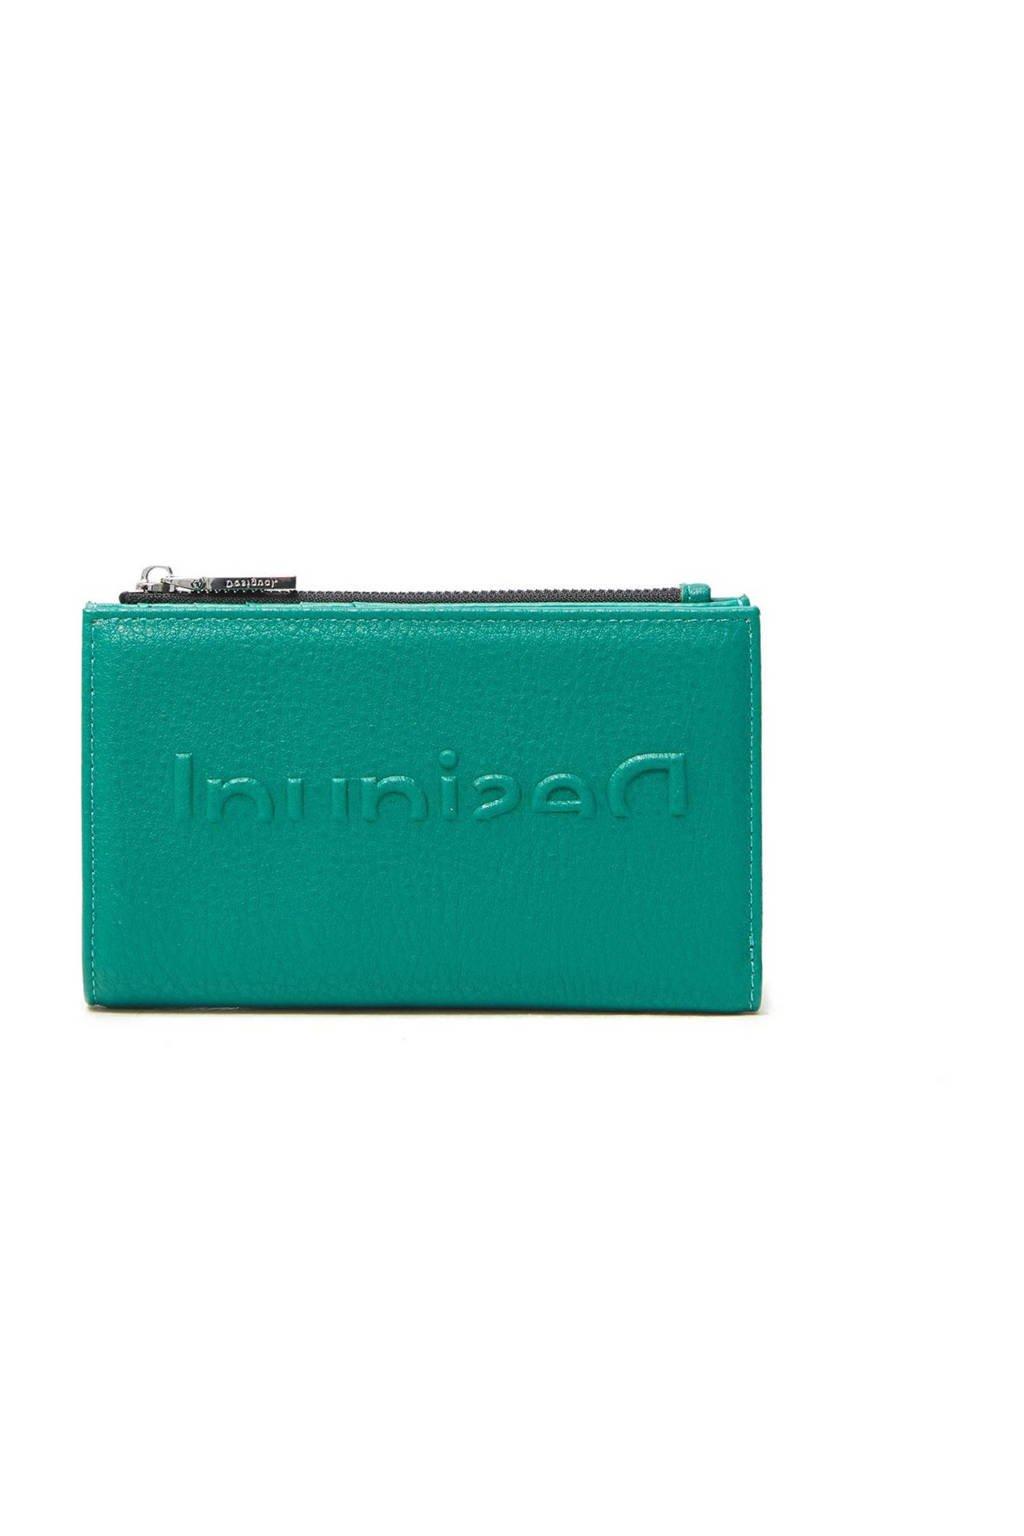 Desigual portemonnee turquoise, Turquoise